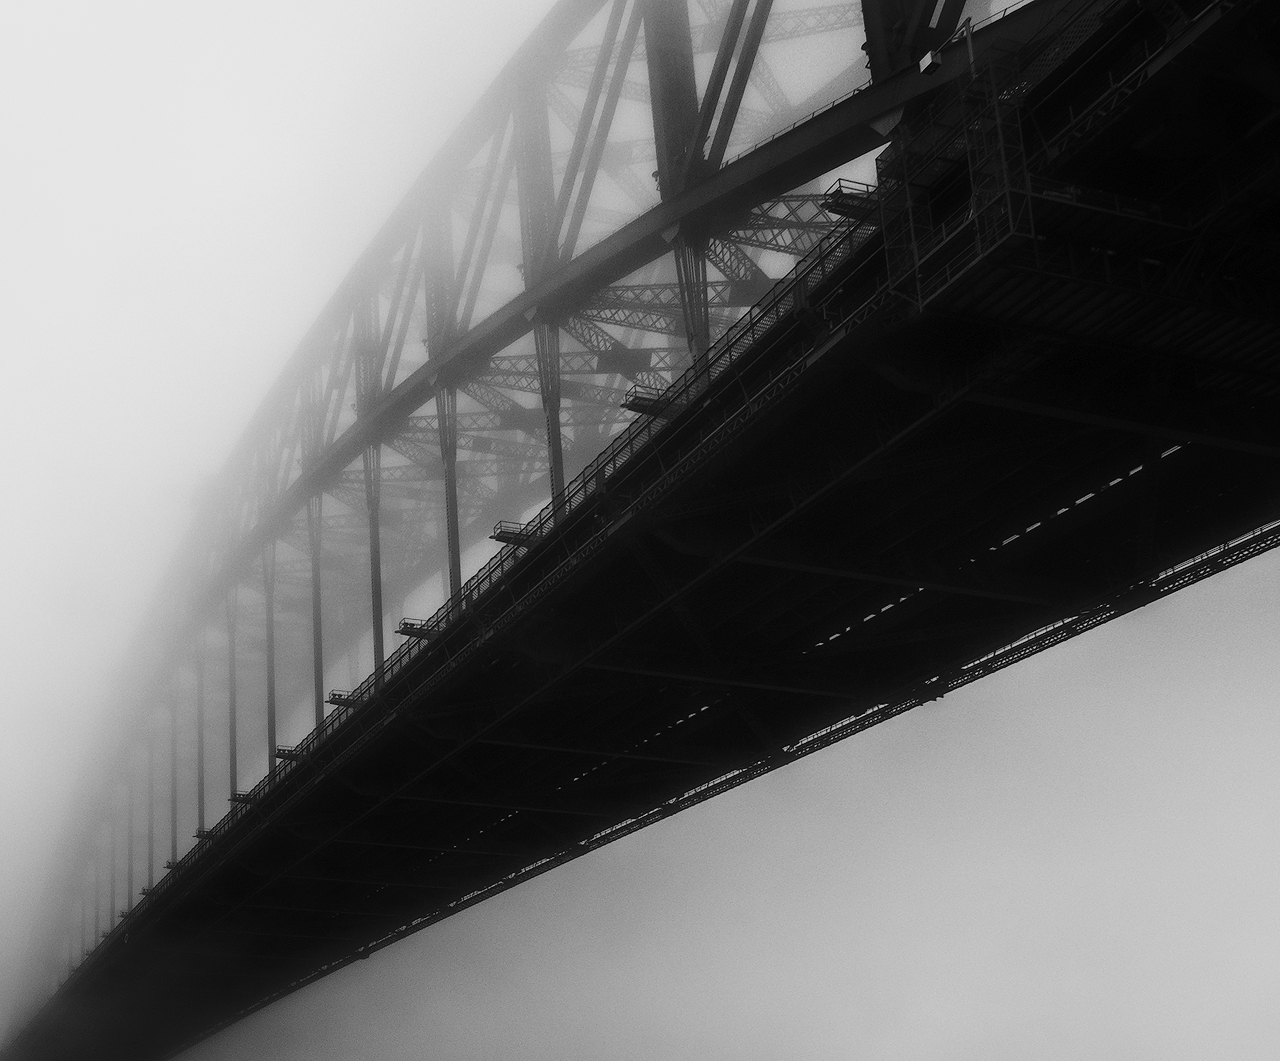 Sydney Harbour Bridge in the fog (eastern face)